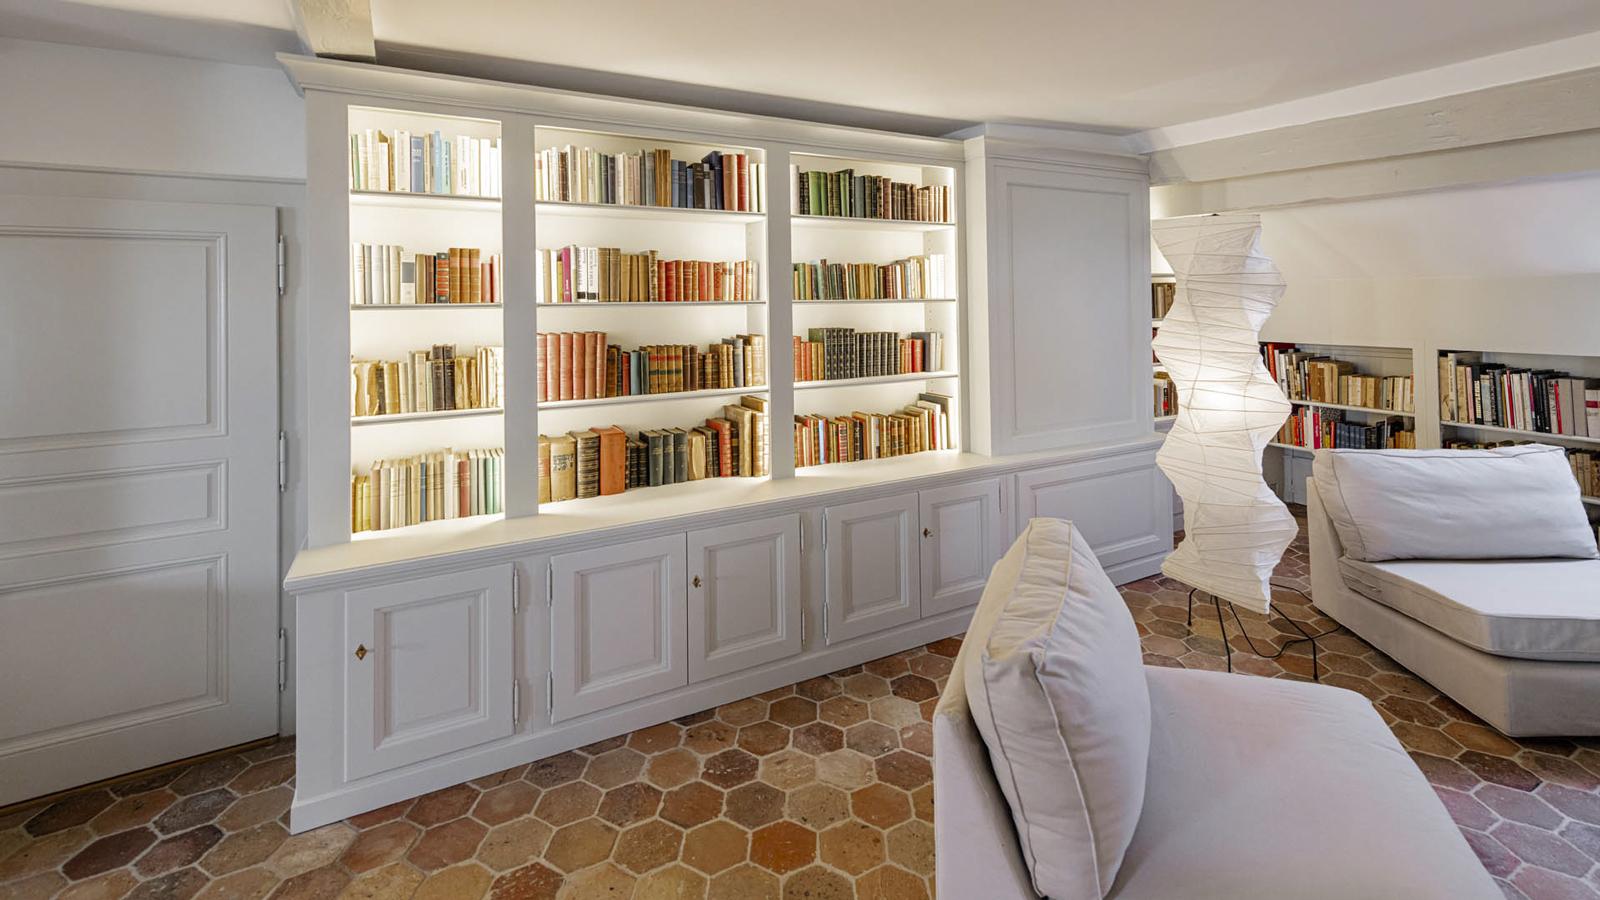 CSDK Architectes Bibliothe%CC%80que Cre%CC%81ation 7 - Custom-made bookcase - Geneva - CSDK Architectes Bibliothe%CC%80que Cre%CC%81ation 7